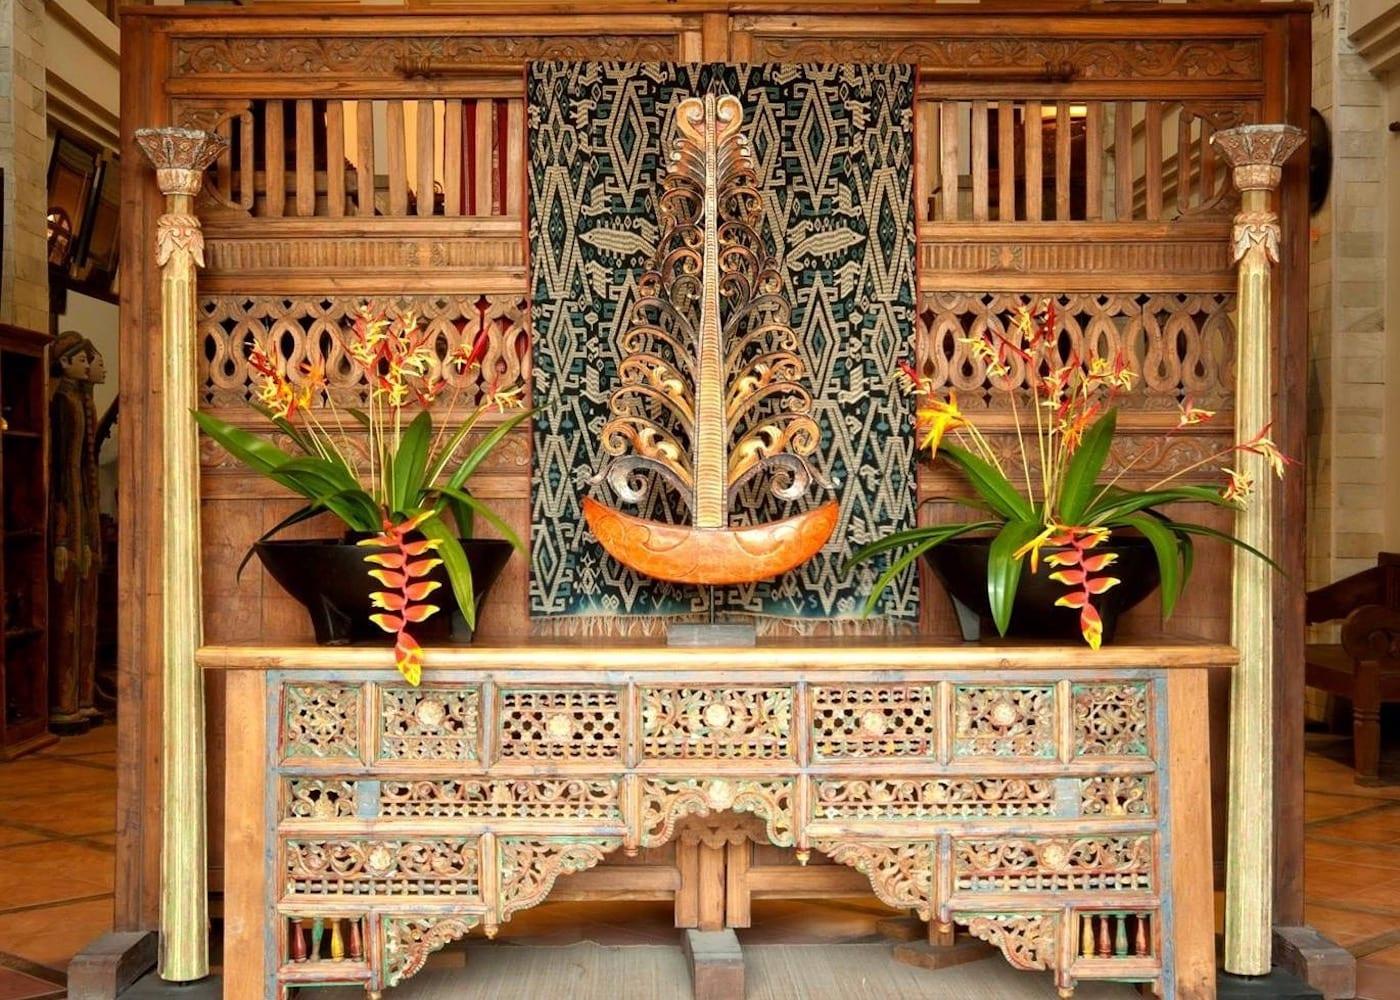 Ikat Gallery & Furniture Store in Bali, Indonesia